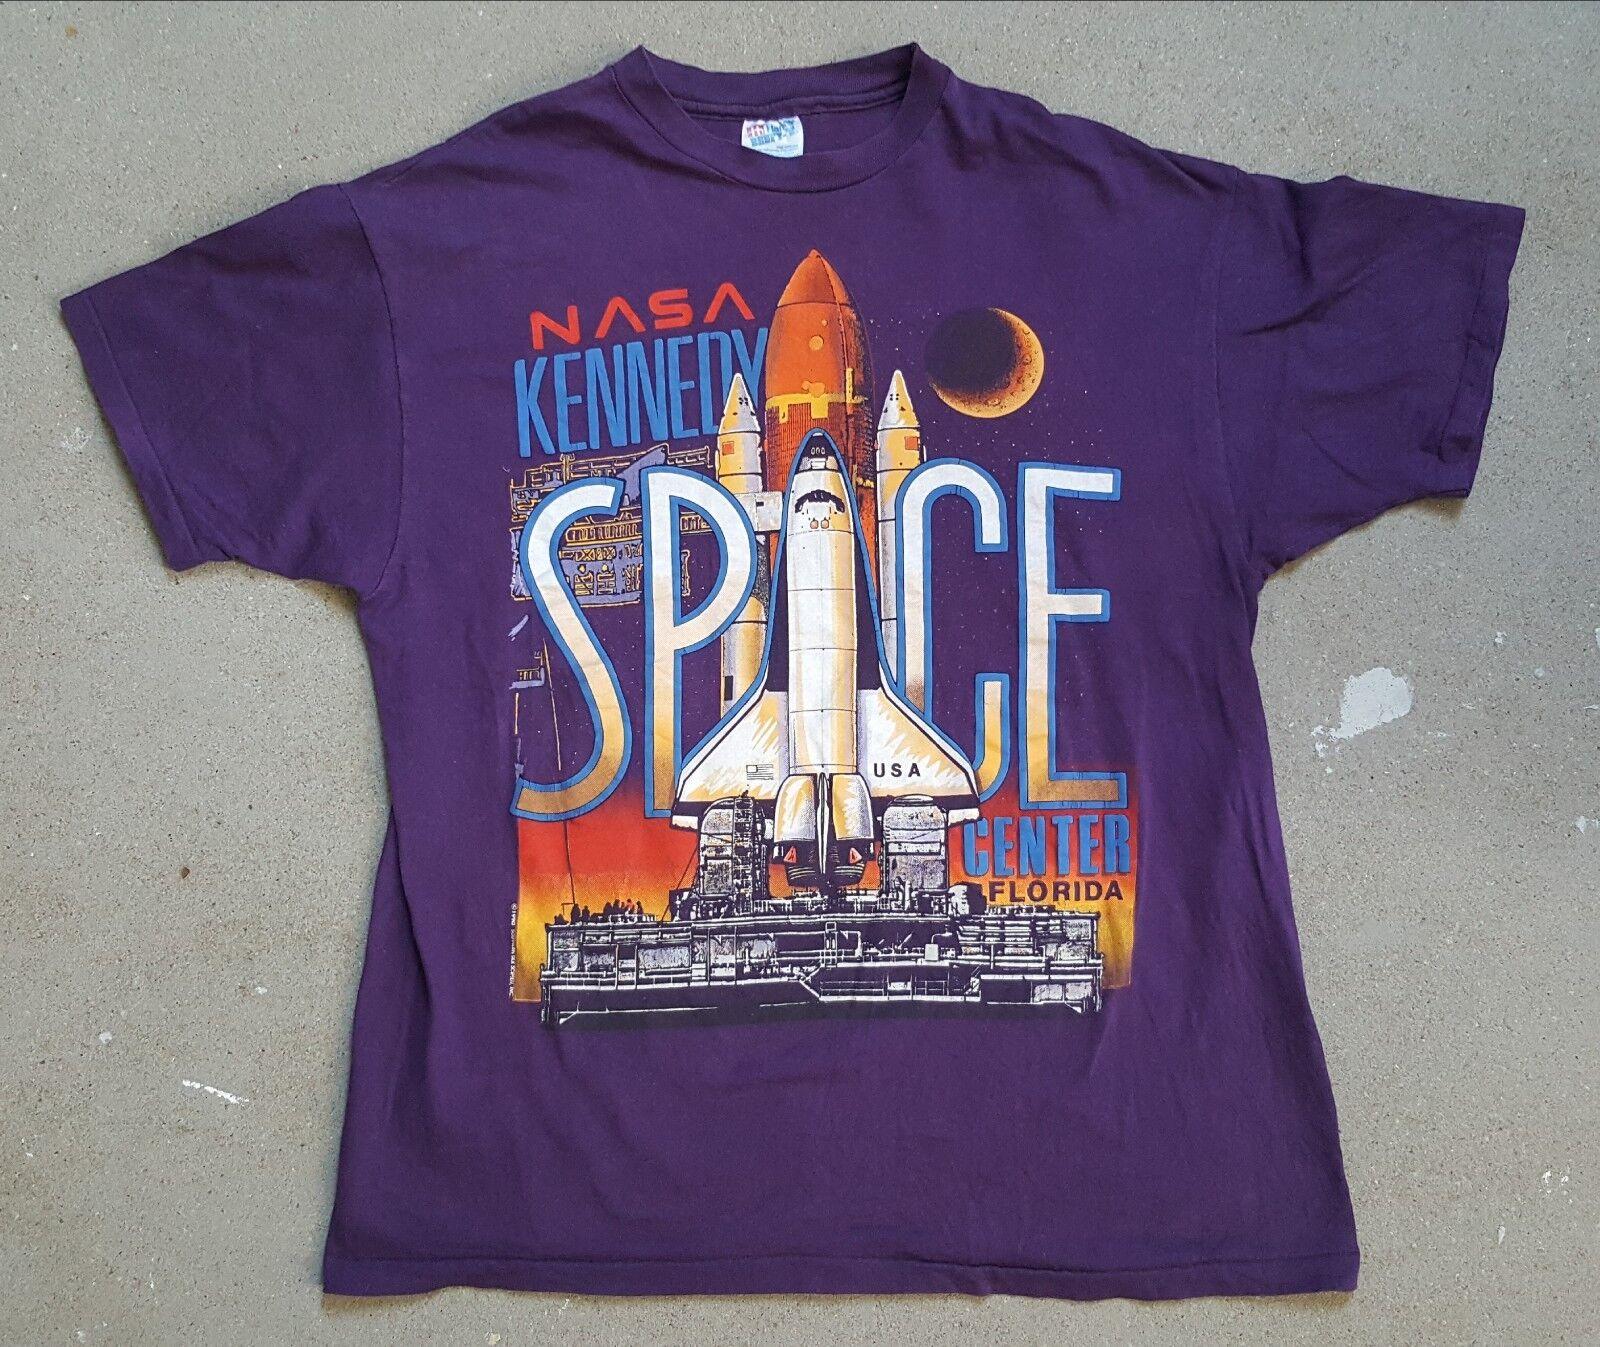 Vintage NASA Kennedy Space Center Shuttle 1990  T-Shirt Large RaRe